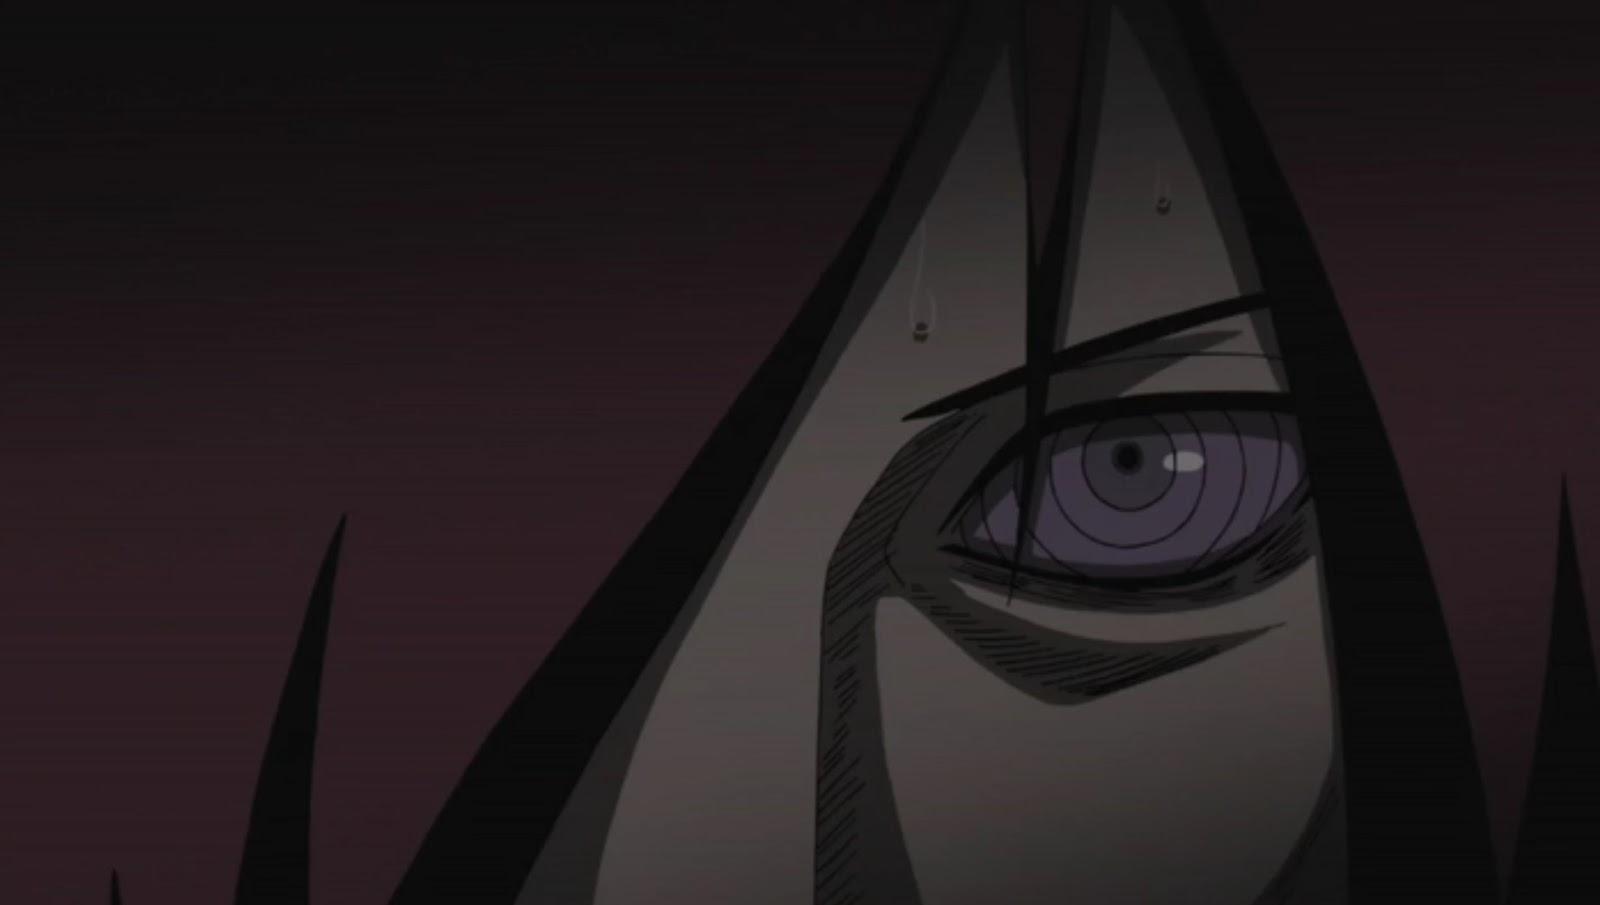 Naruto Shippuden: Episódio 165 – Captura Completa da Kyuubi